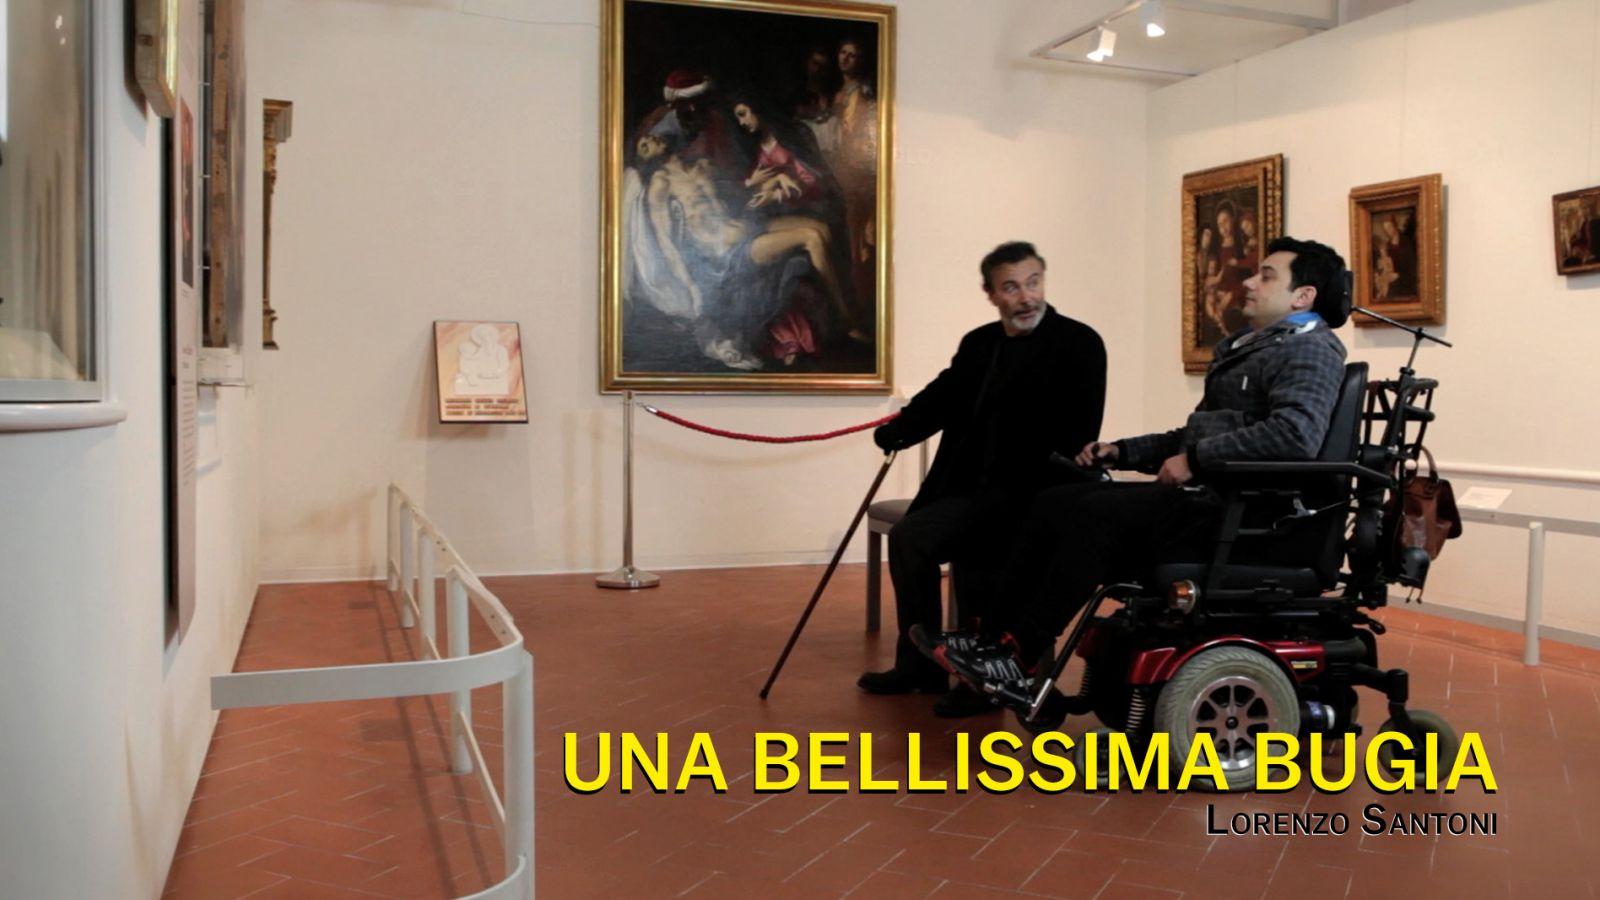 Una bellissima bugia, Lorenzo Santoni